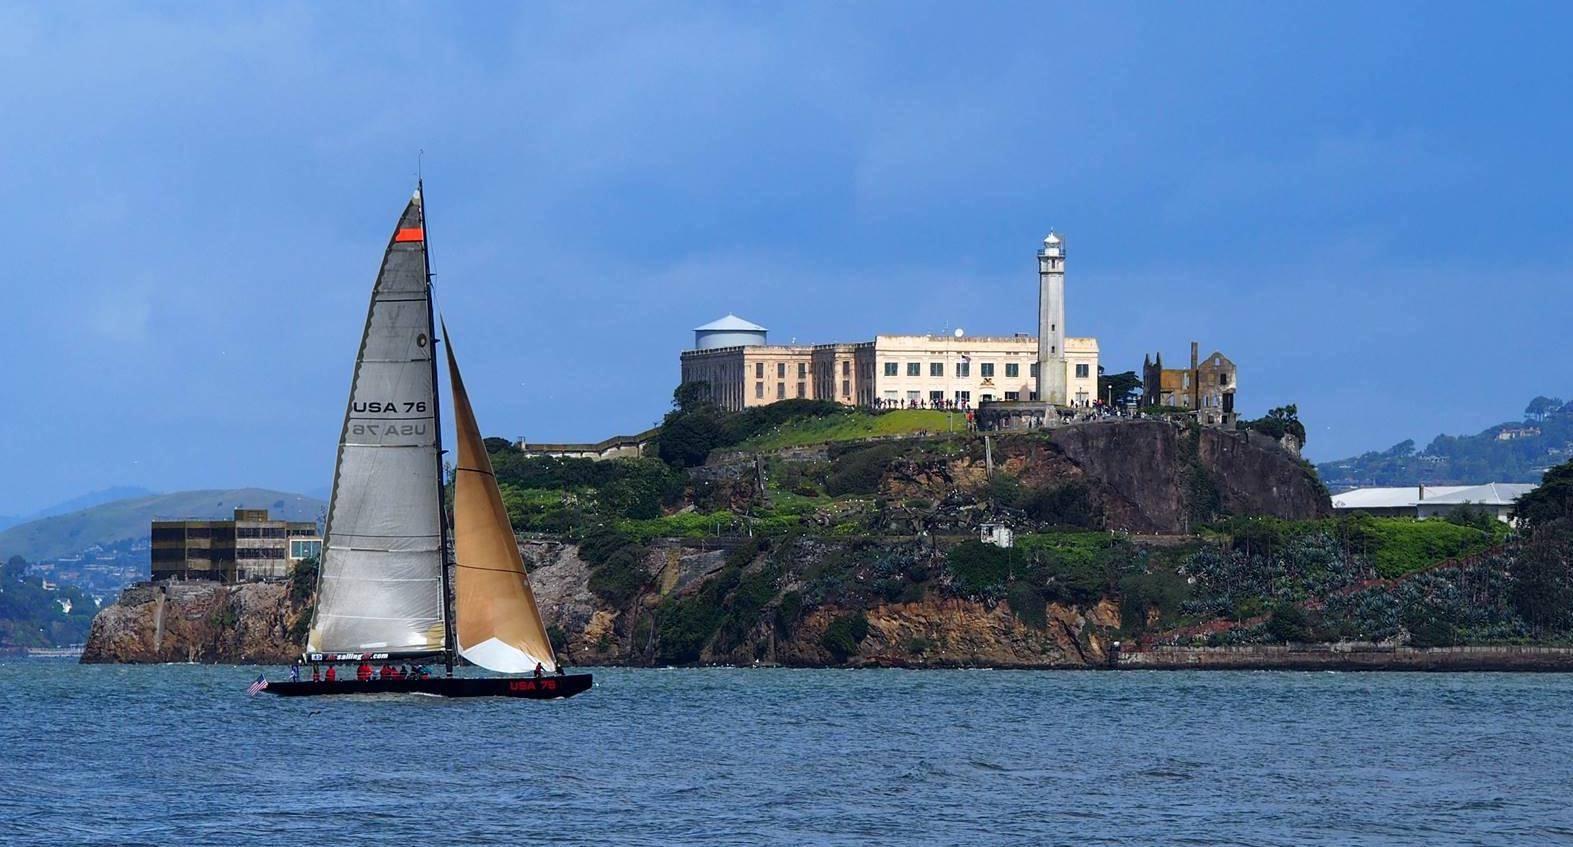 Alcatraz tours and Cruises on yacht USA 76